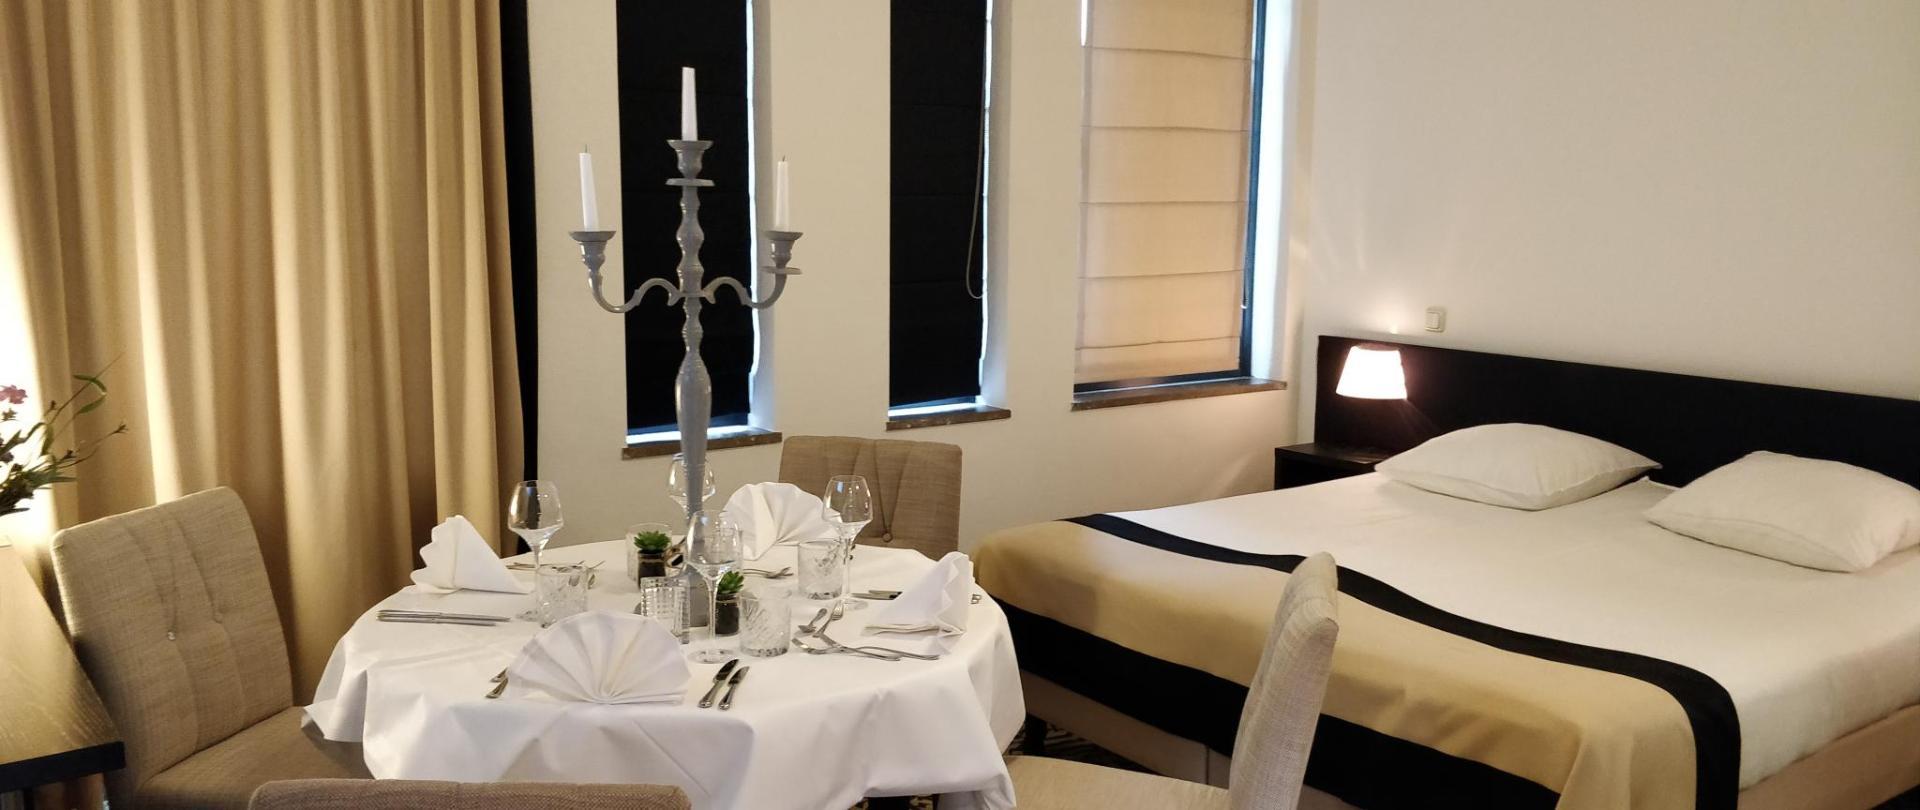 Diner op hotelkamer.jpg